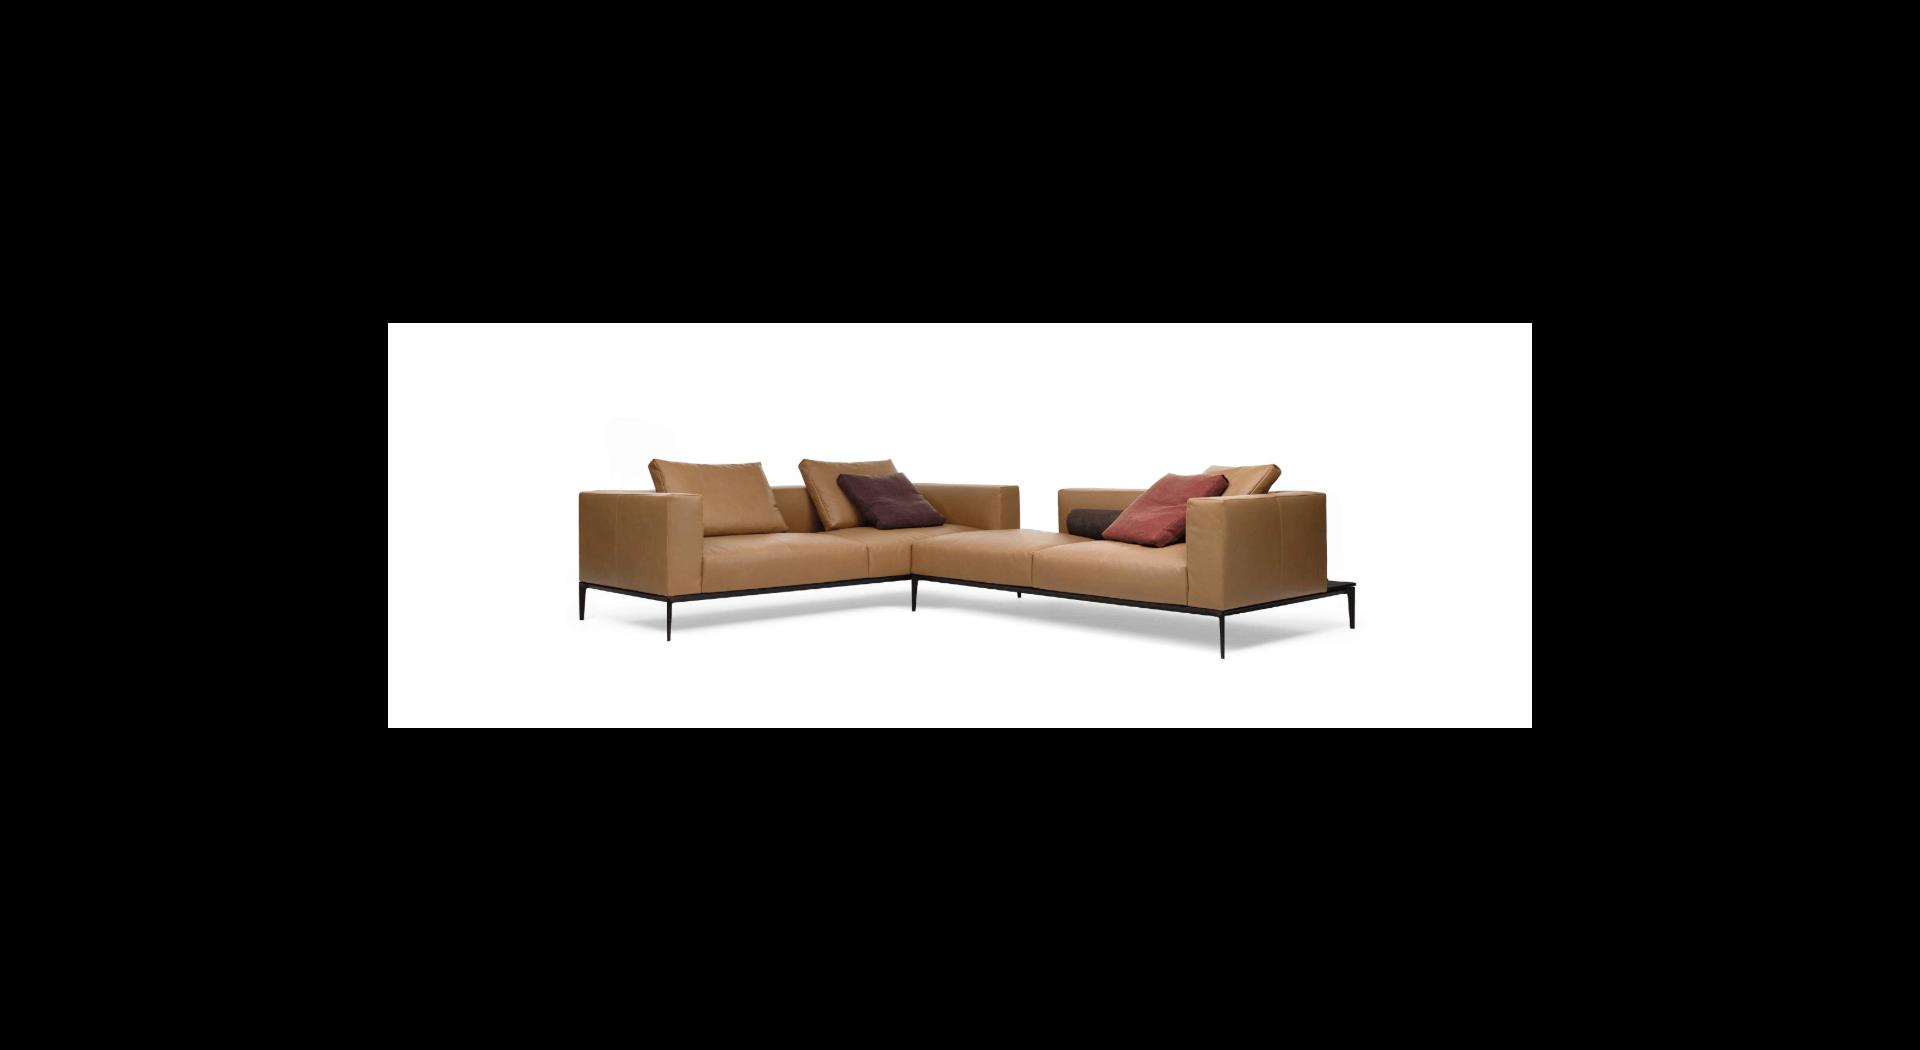 Jaan Living Alternativ Walter Knoll Sofas For Reception Lounge Area